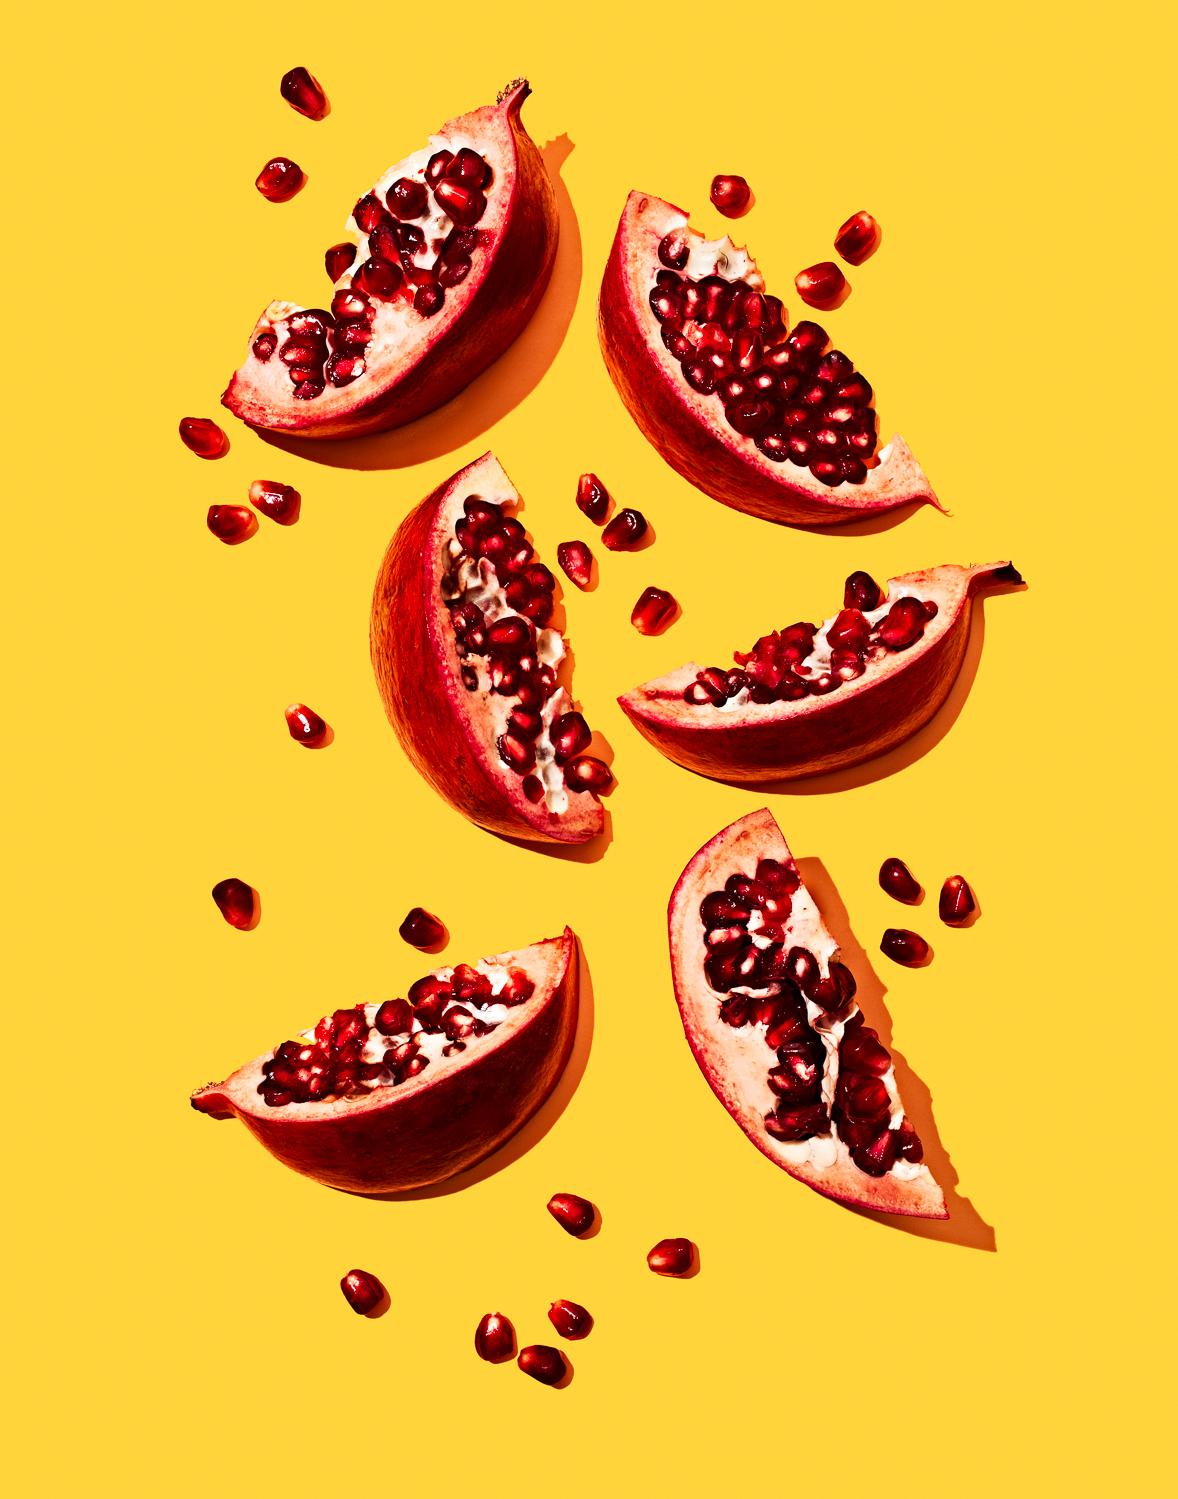 131208 Food Fruit Pomegranate.jpg